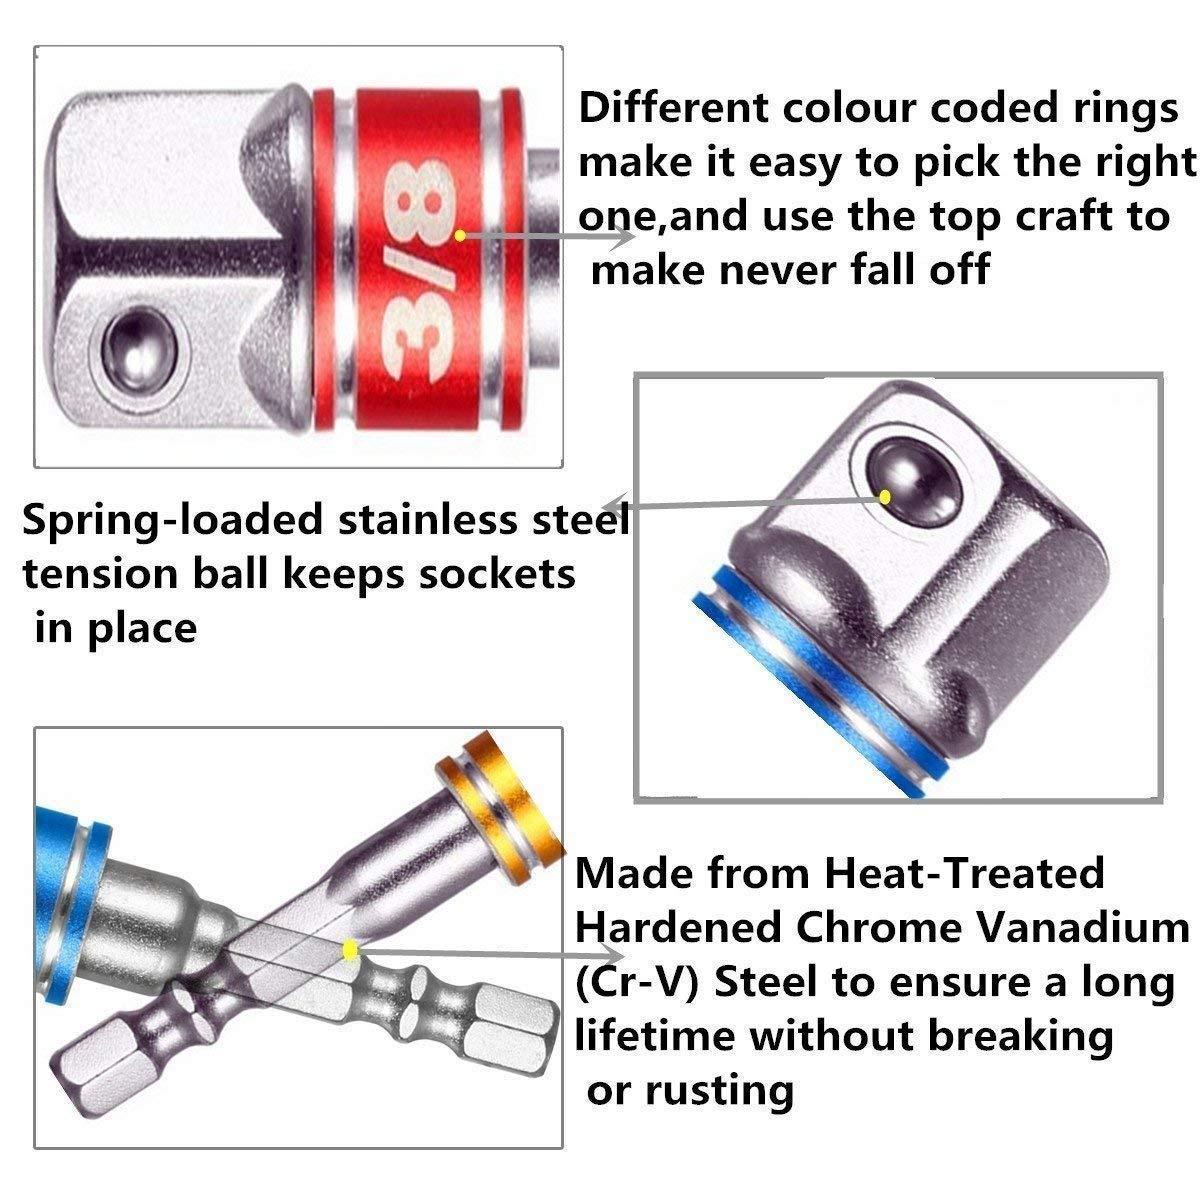 Power Hand Tools,Drill Bits Set,Impact Driver Bit Set,3Pcs1//43//81//2Hex Shank Bit Square Nut Driver Set Power Drill Cordless Impact Sockets Bit Set Adapter,Socket Wrench Set Ratchet Extension